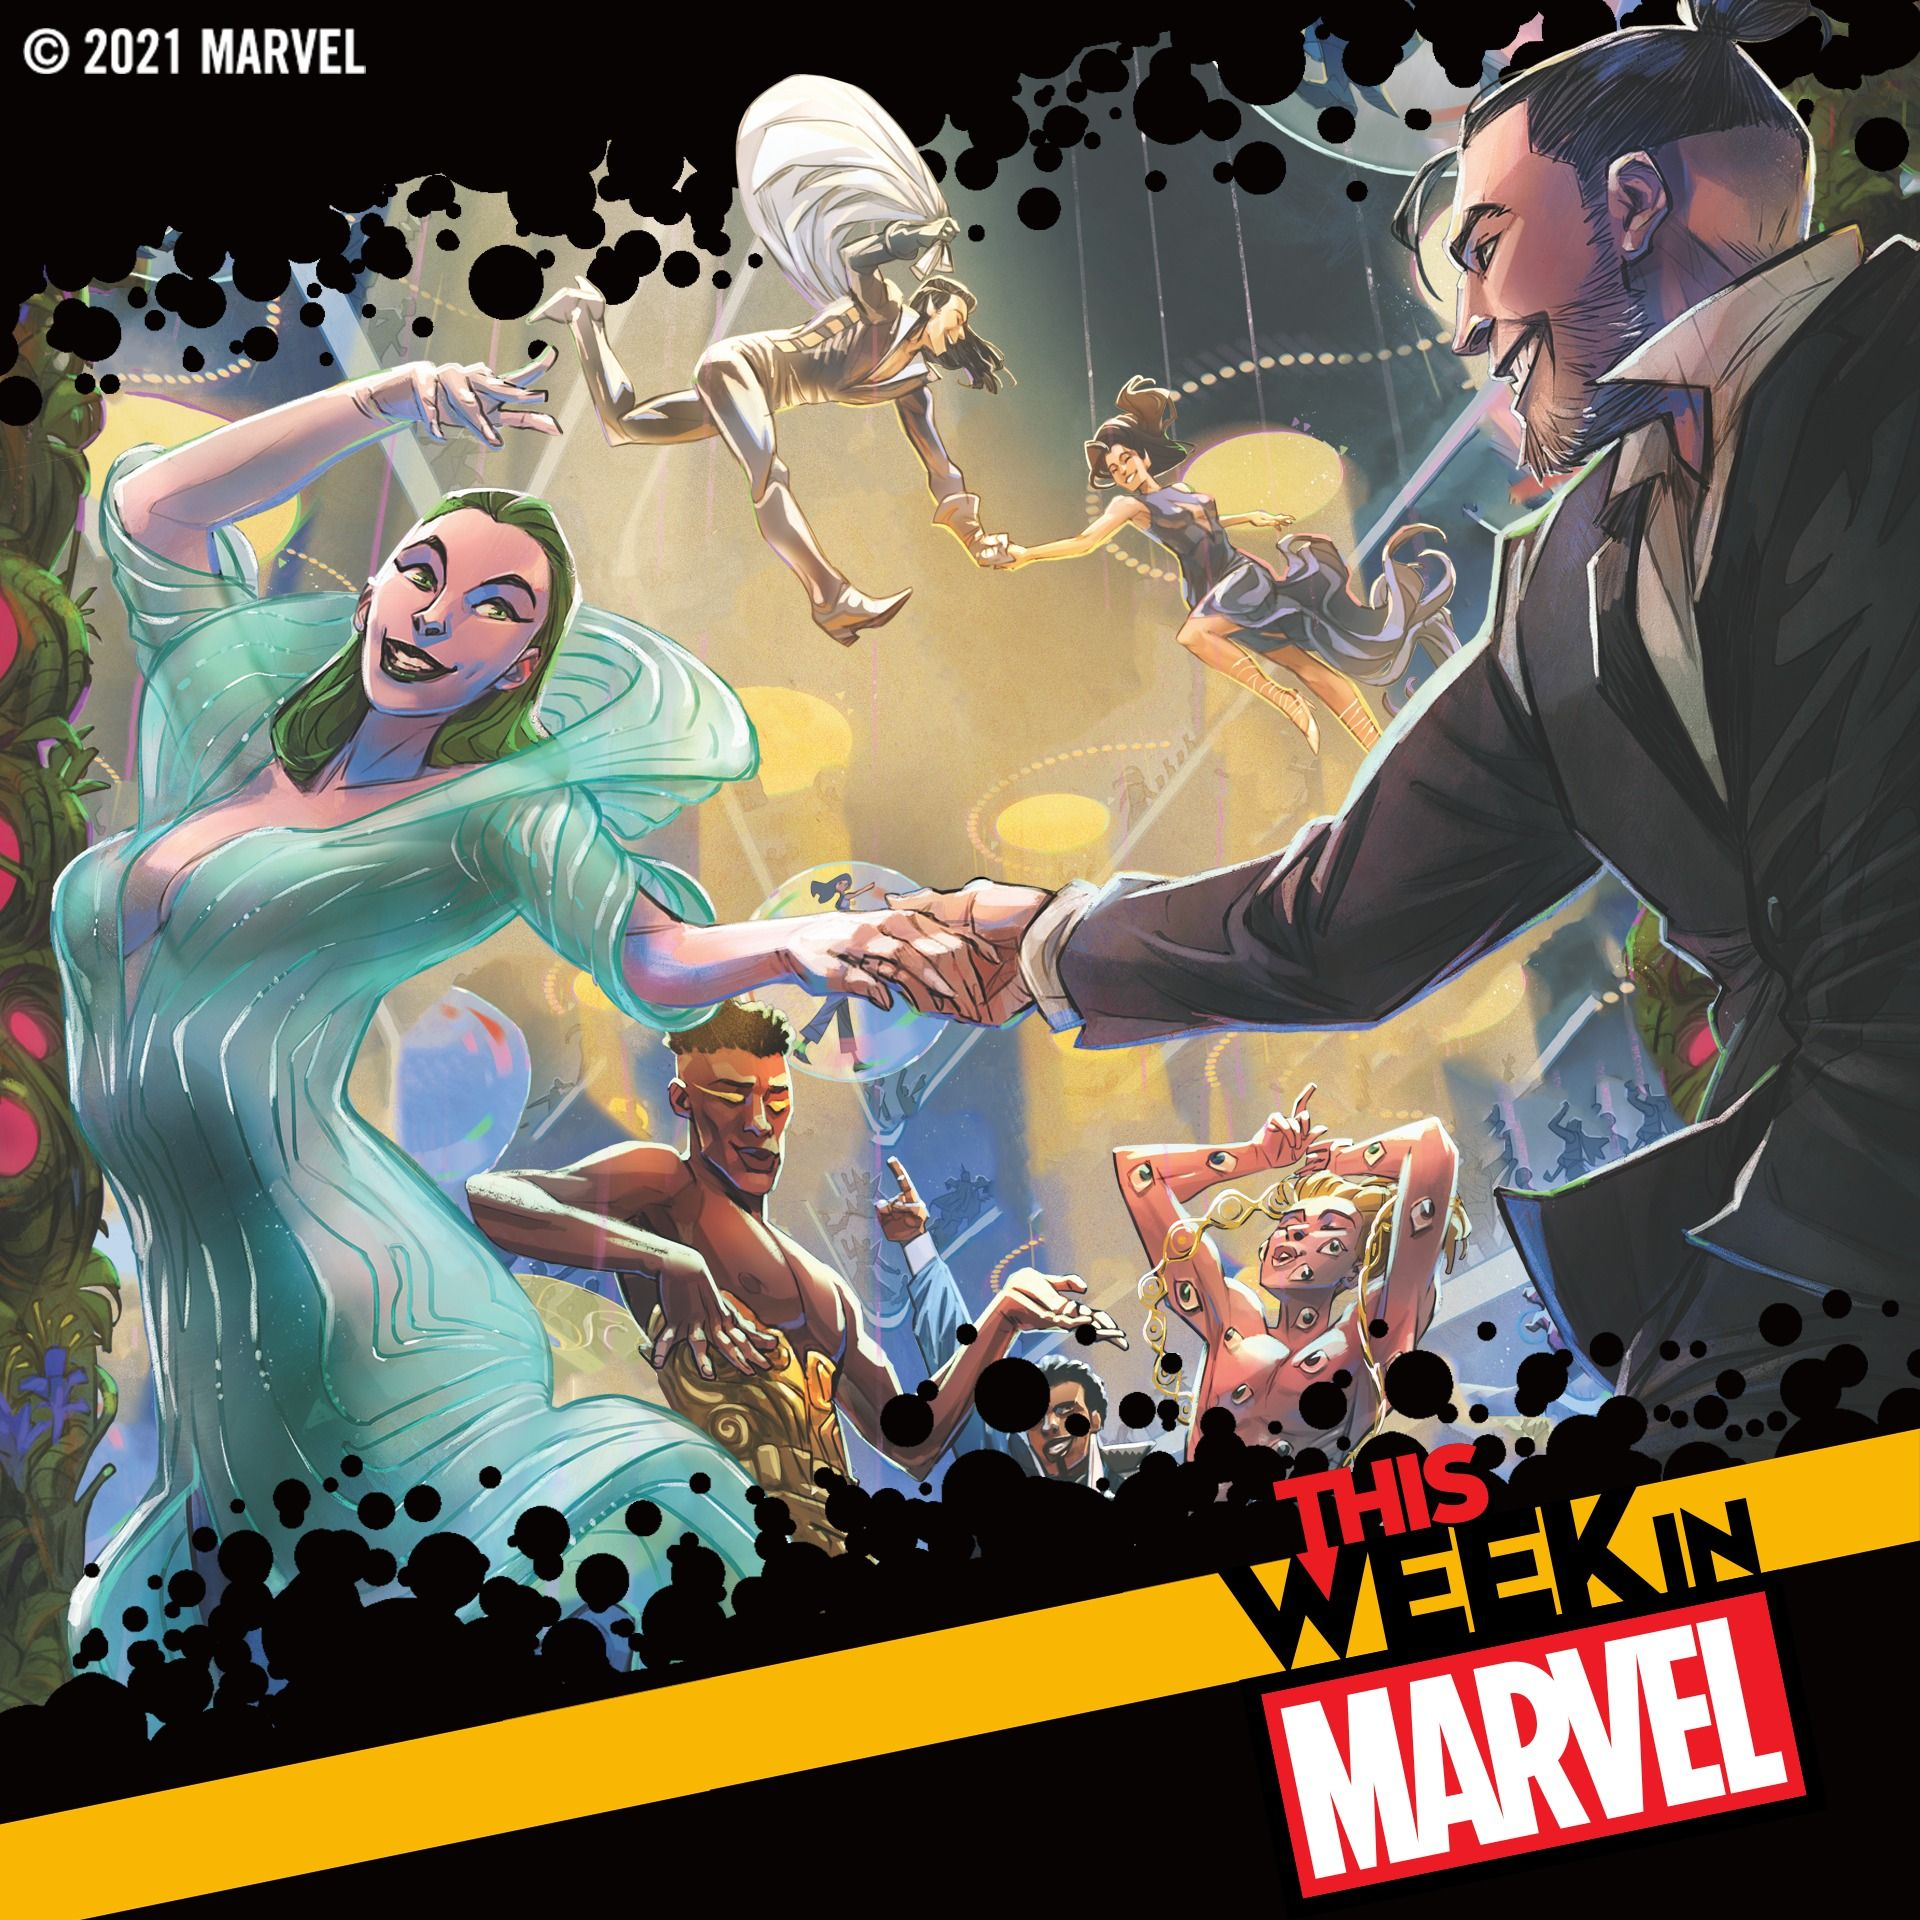 Black Widow Fan Event, Shang-Chi Trailer, and X-Men Updates!